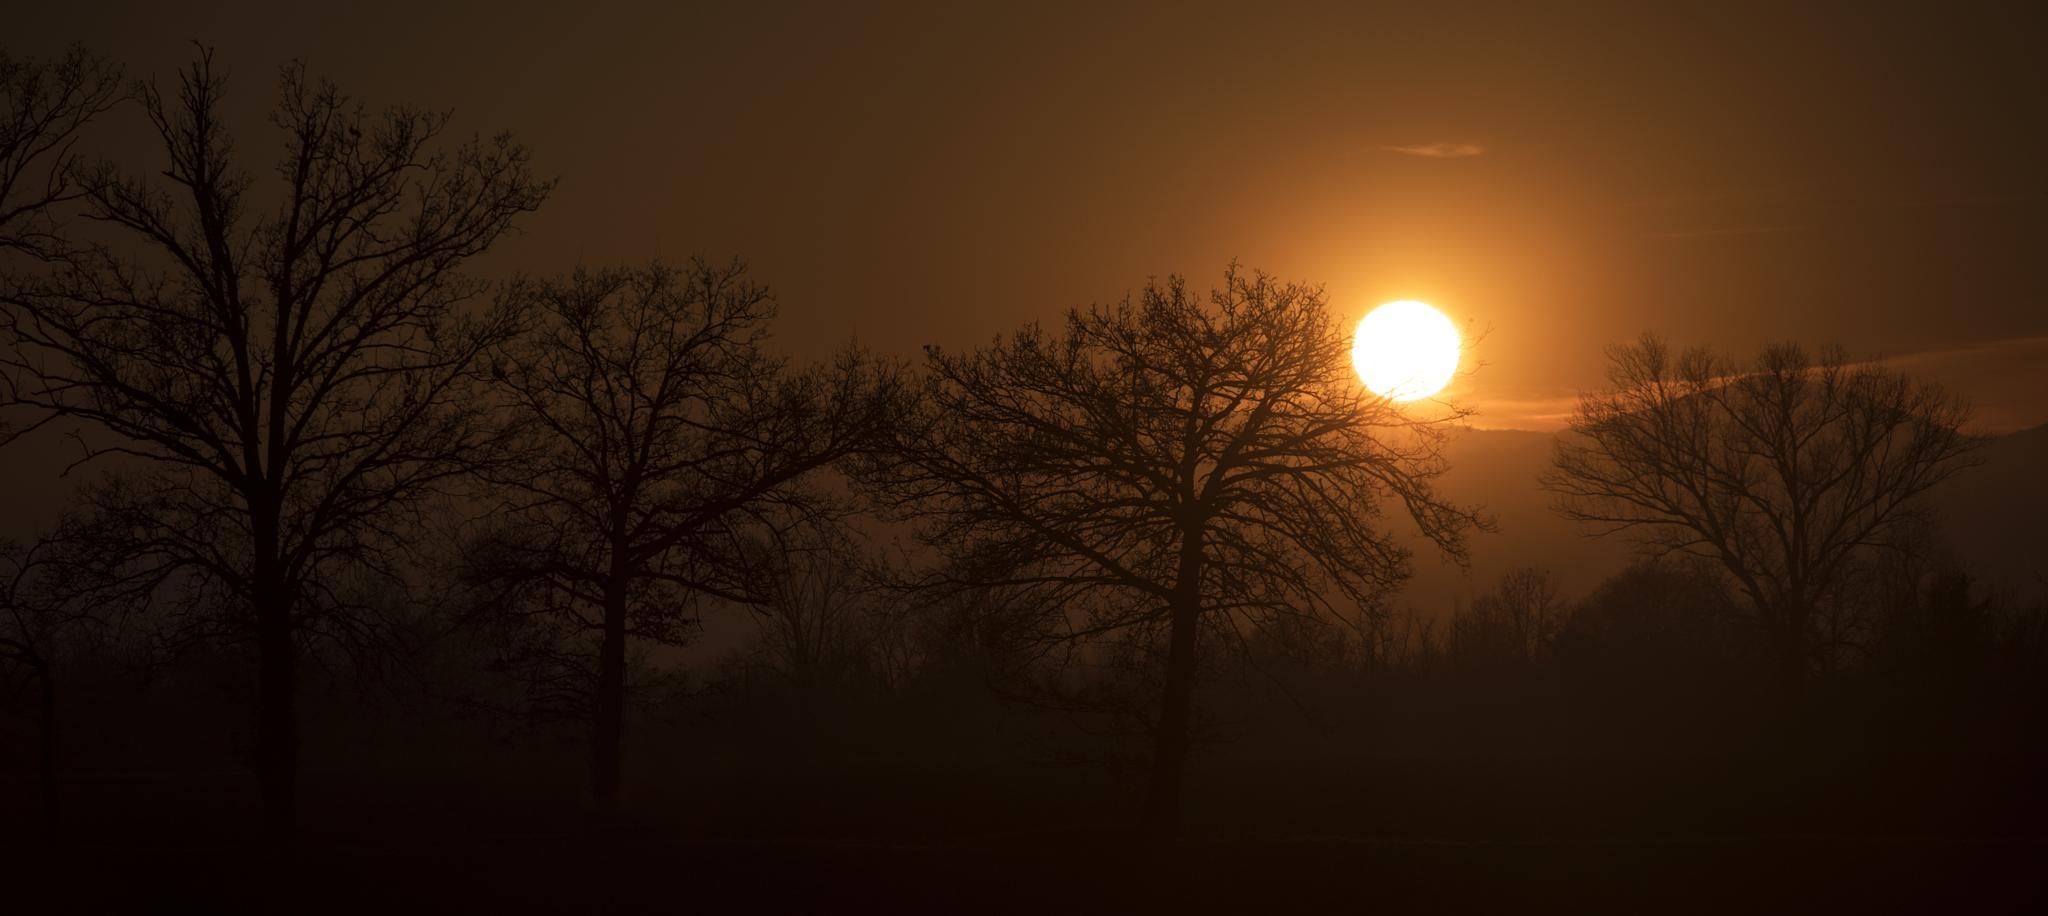 Foggy sunset by roberto.fustinoni.60